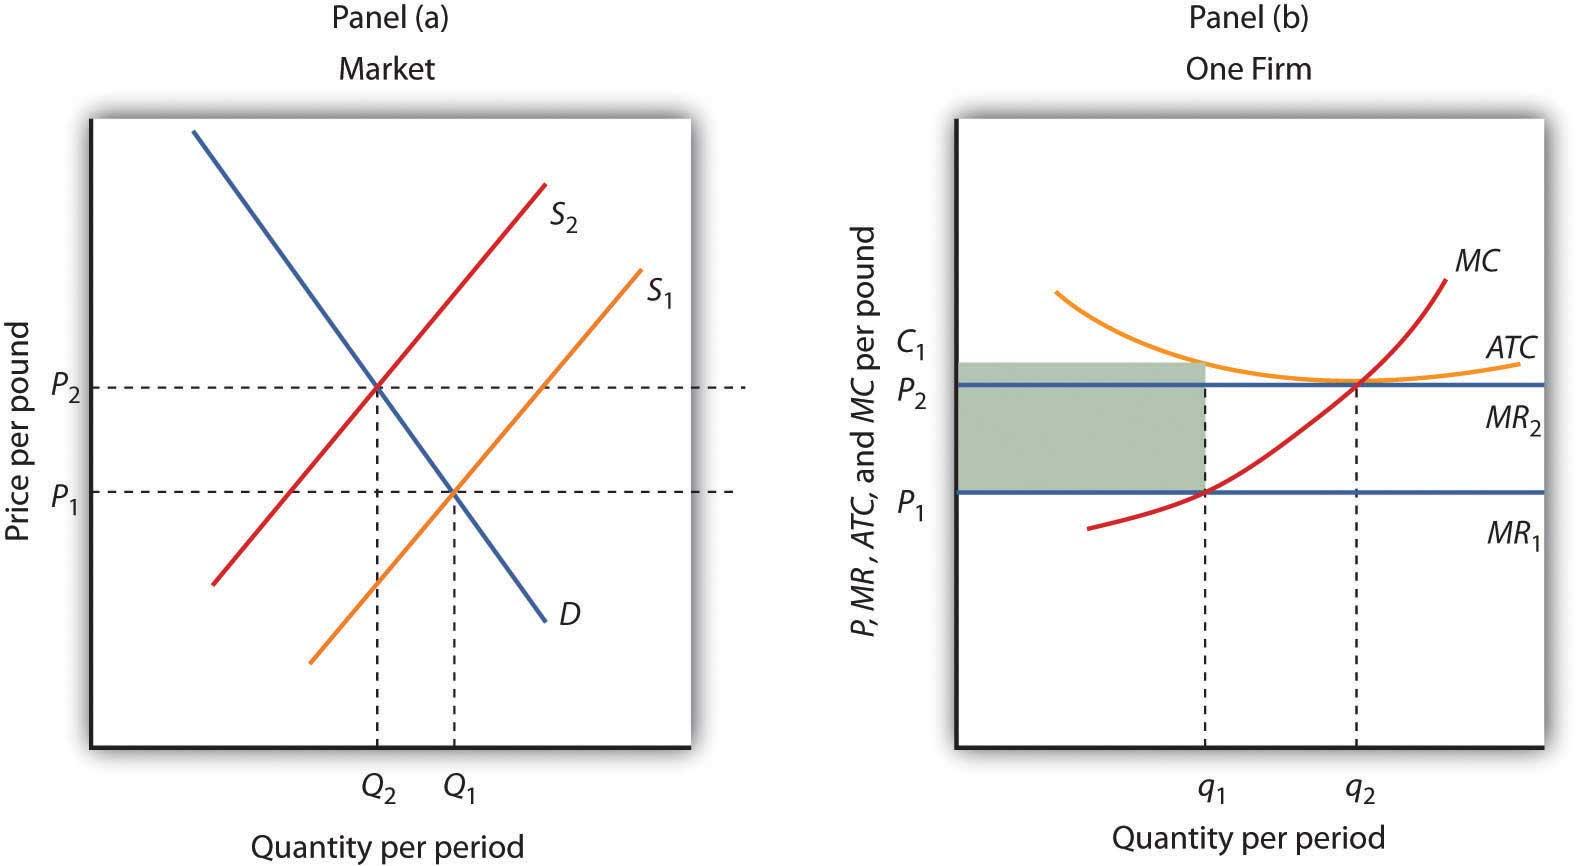 Figure 9.10 Eliminating Economic Losses in the Long Run